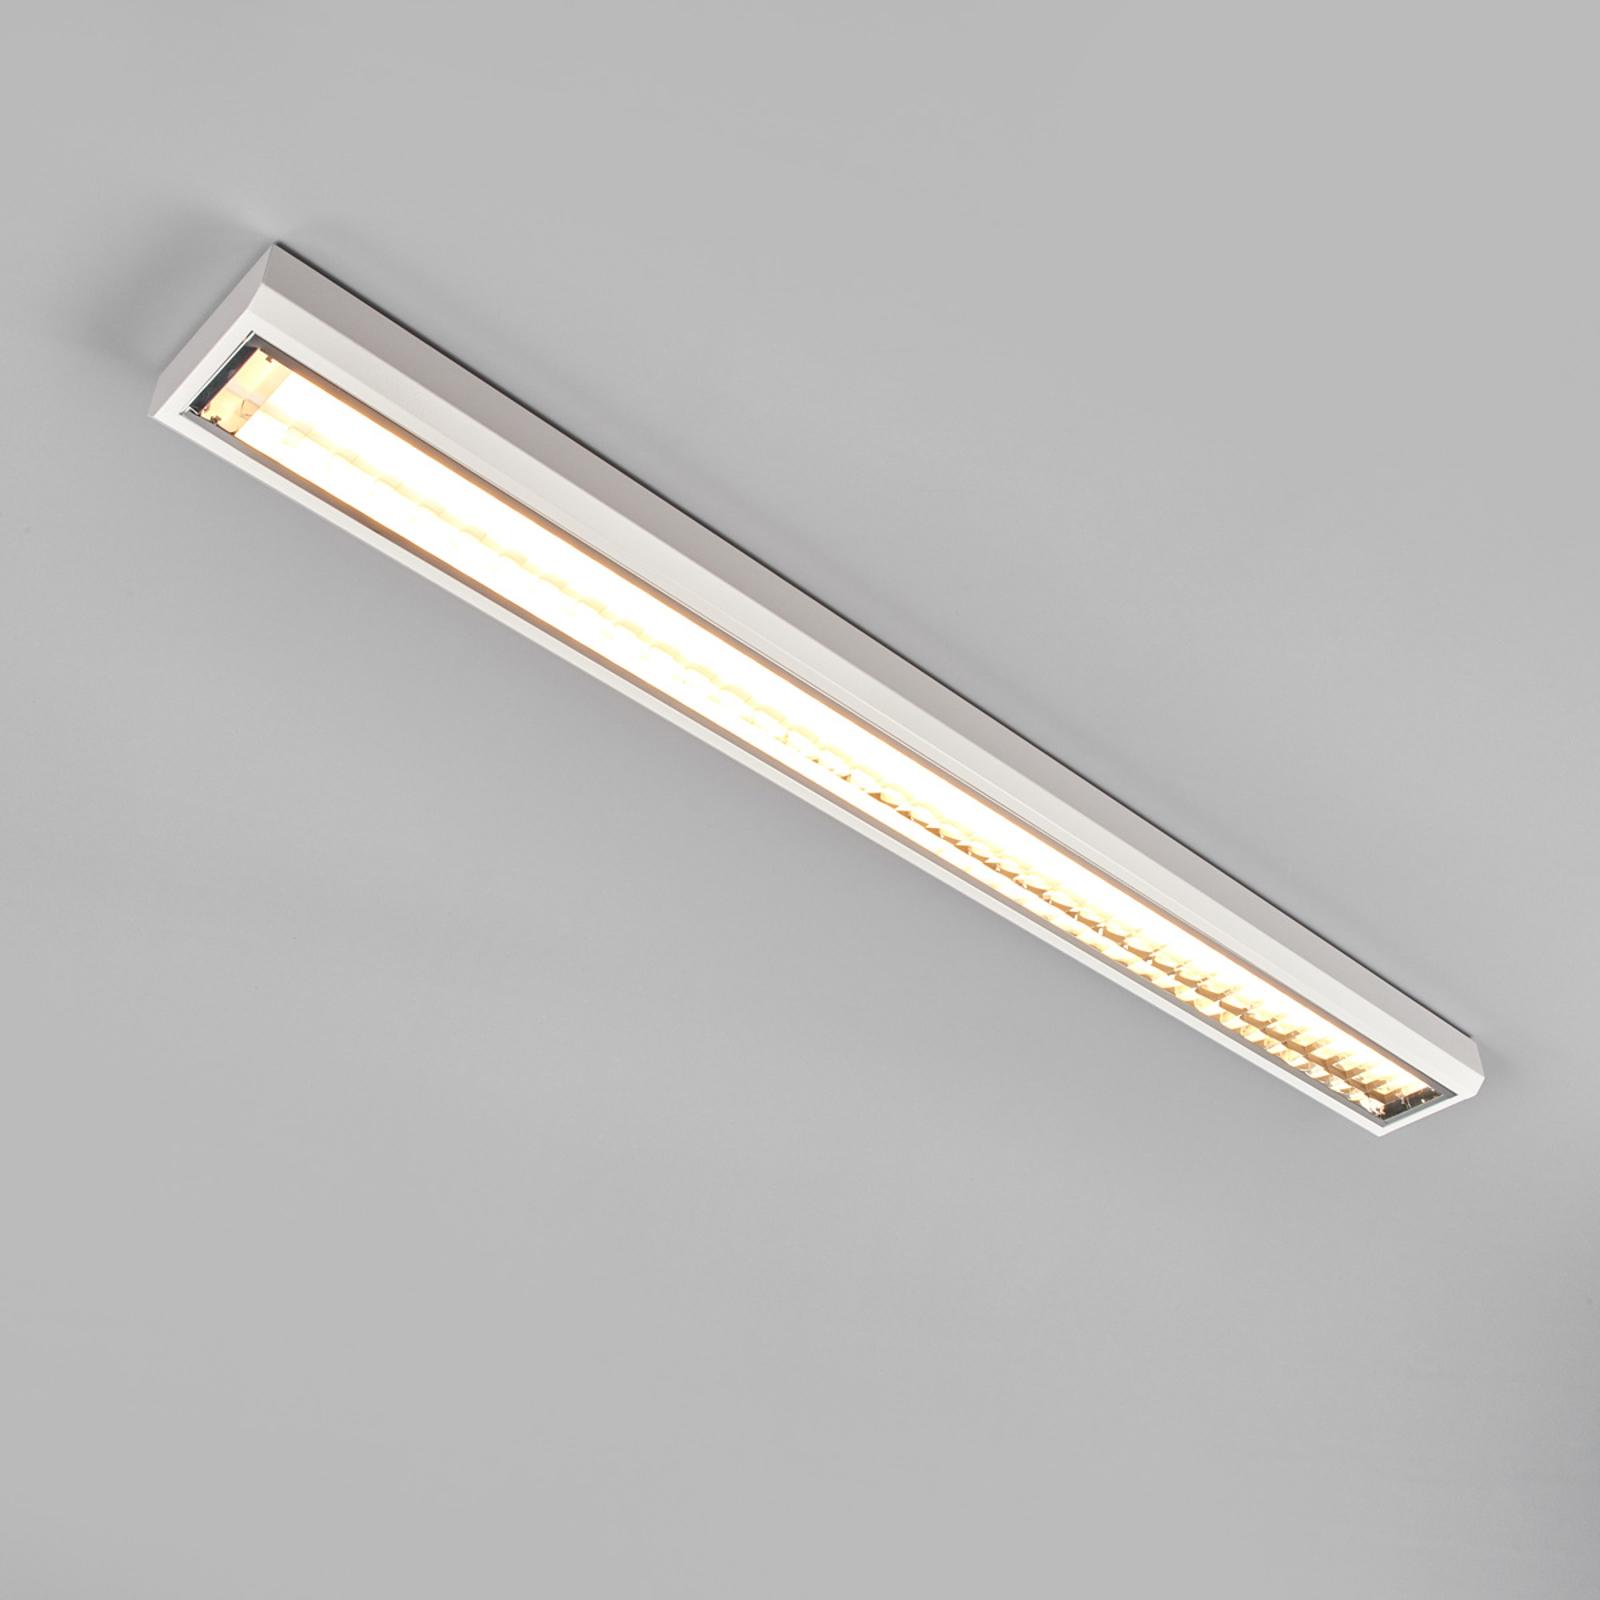 LED-Rasteranbauleuchte für Büros, 33 W, 3.000 K